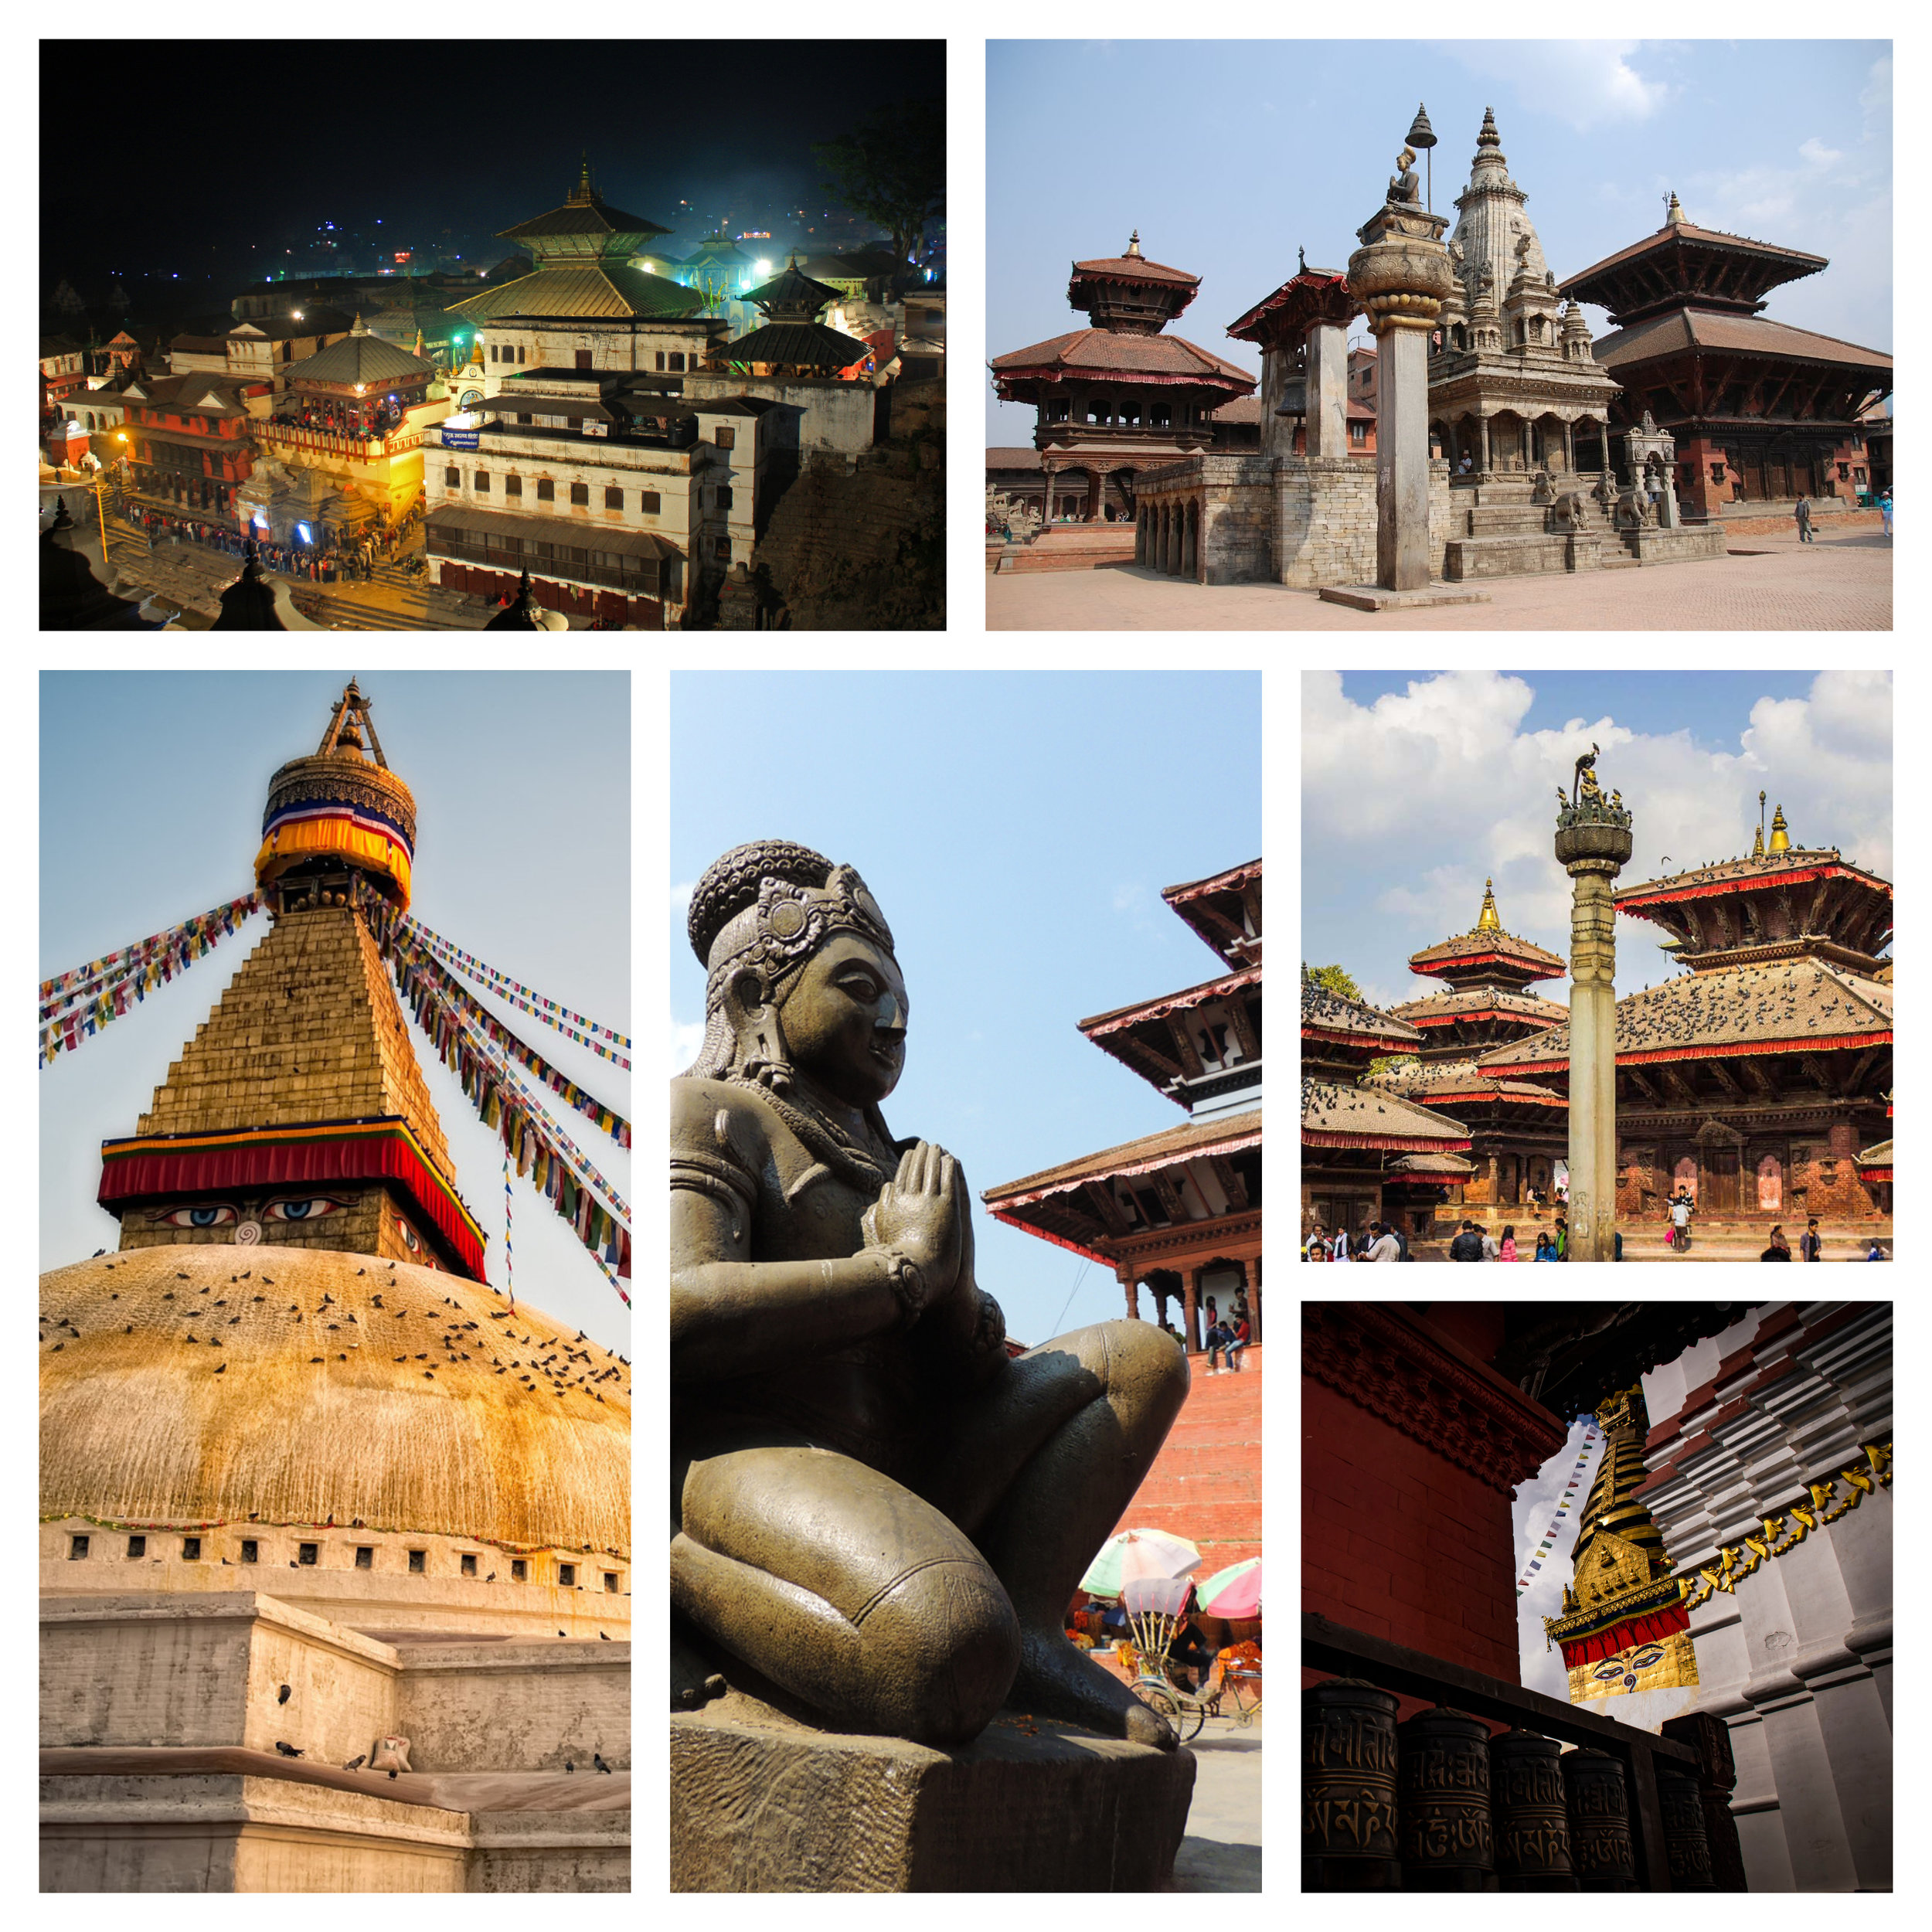 Exclusive Getaway in Kathmandu - Get Free Kathmandu Sightseeing for Booking 3 consecutive nights or above